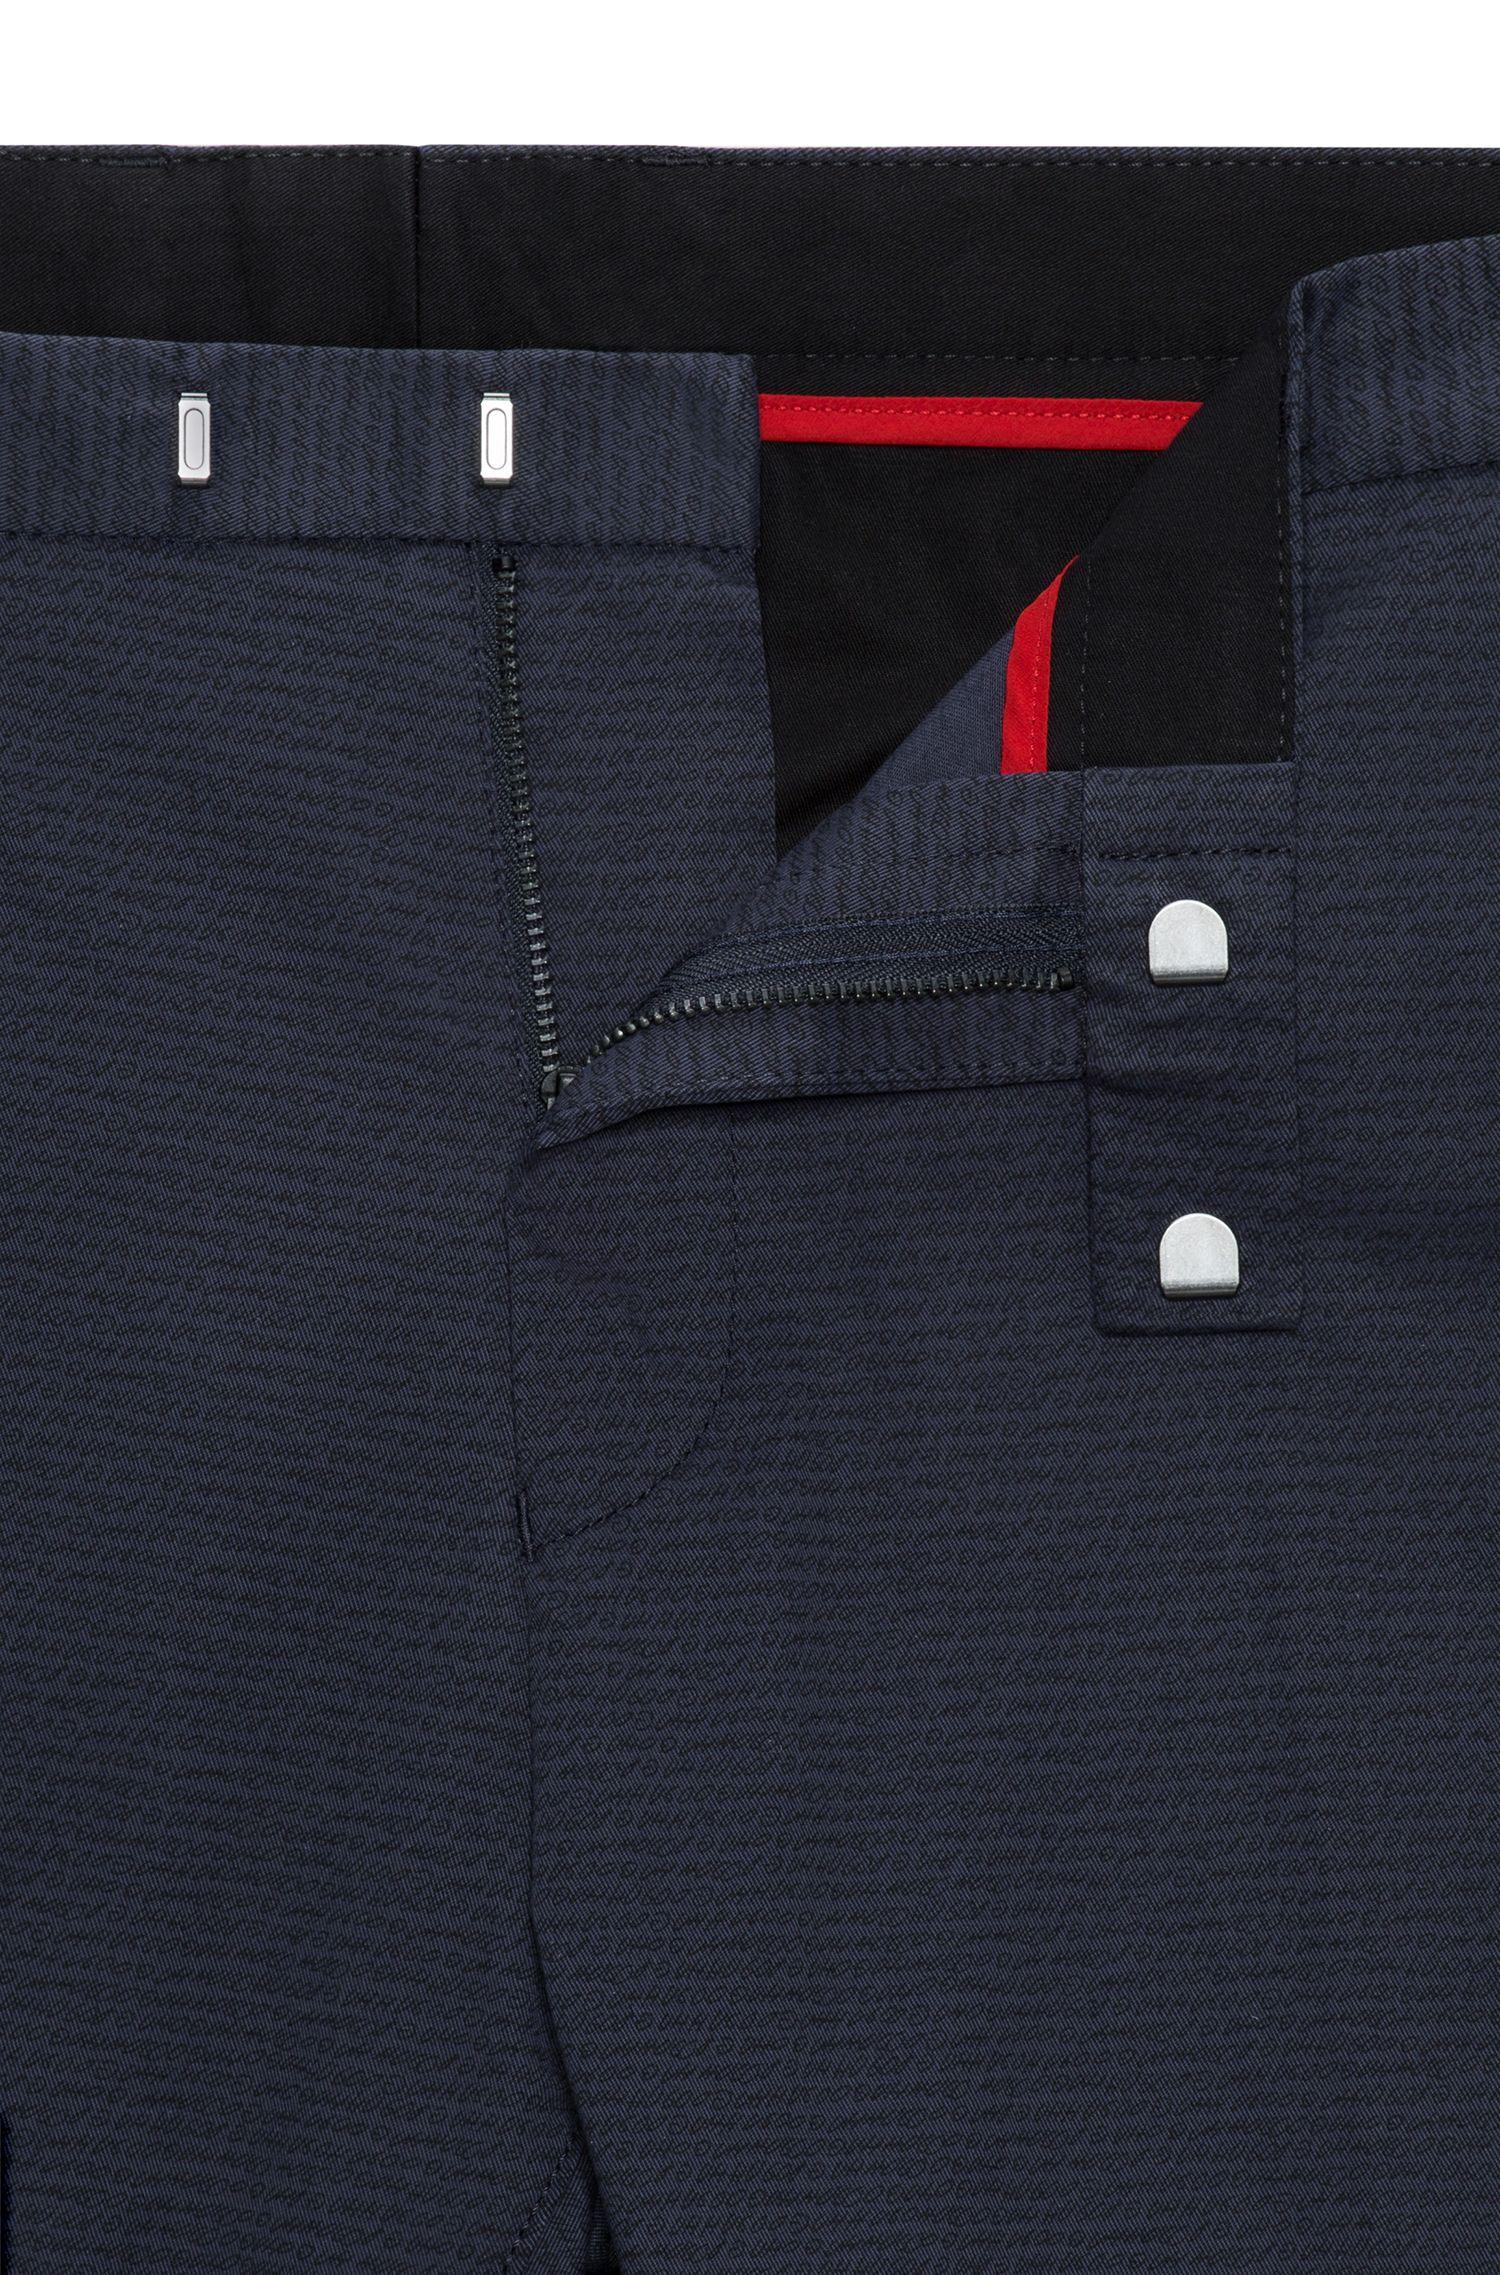 Slim-Fit Hose aus Stretch-Baumwolle mit filigranem Logo-Print